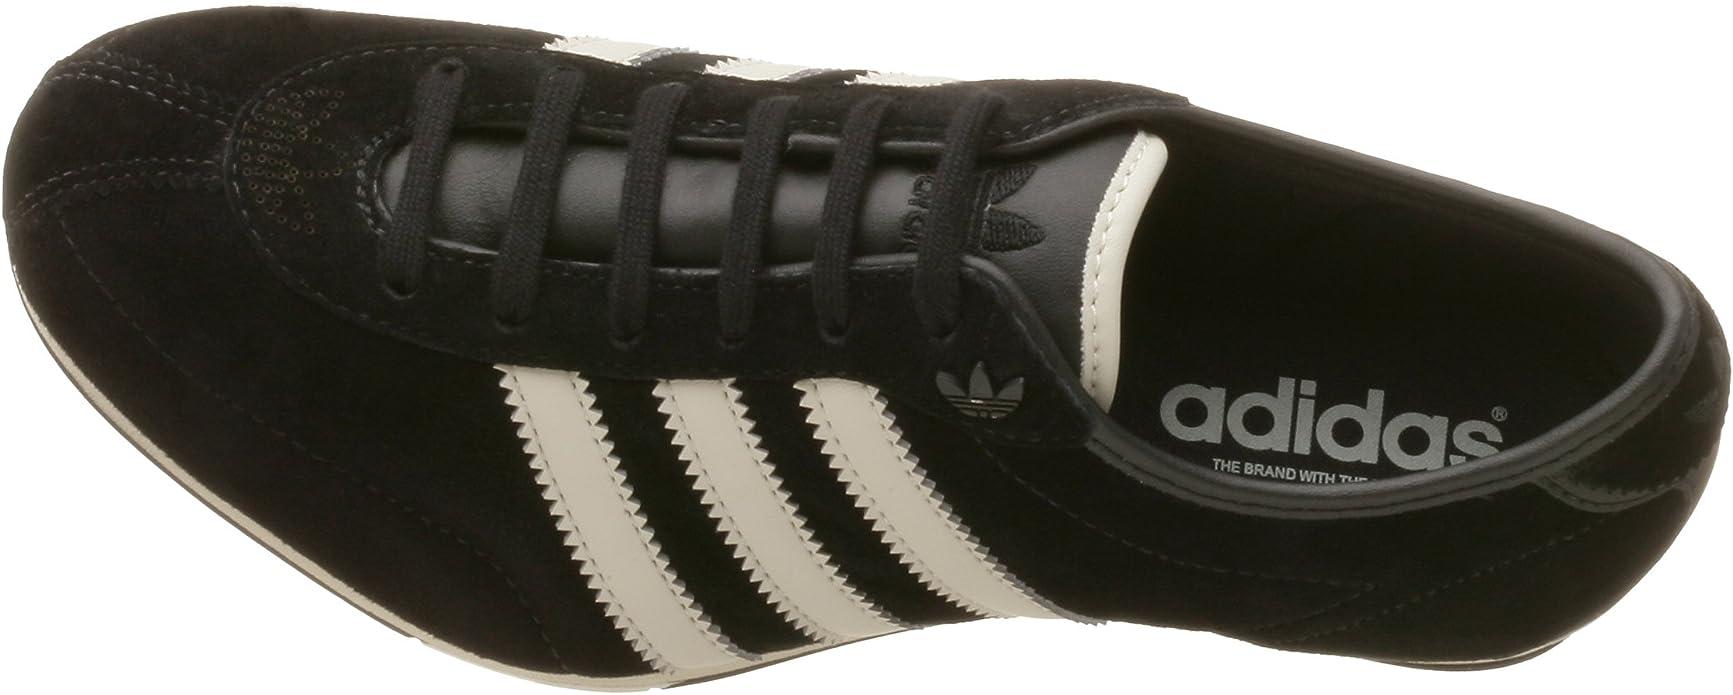 formación bordado inercia  adidas Women's Okapi 2 Suede Running Shoe, Black/DkBone/Black, 5.5 M:  Amazon.co.uk: Shoes & Bags